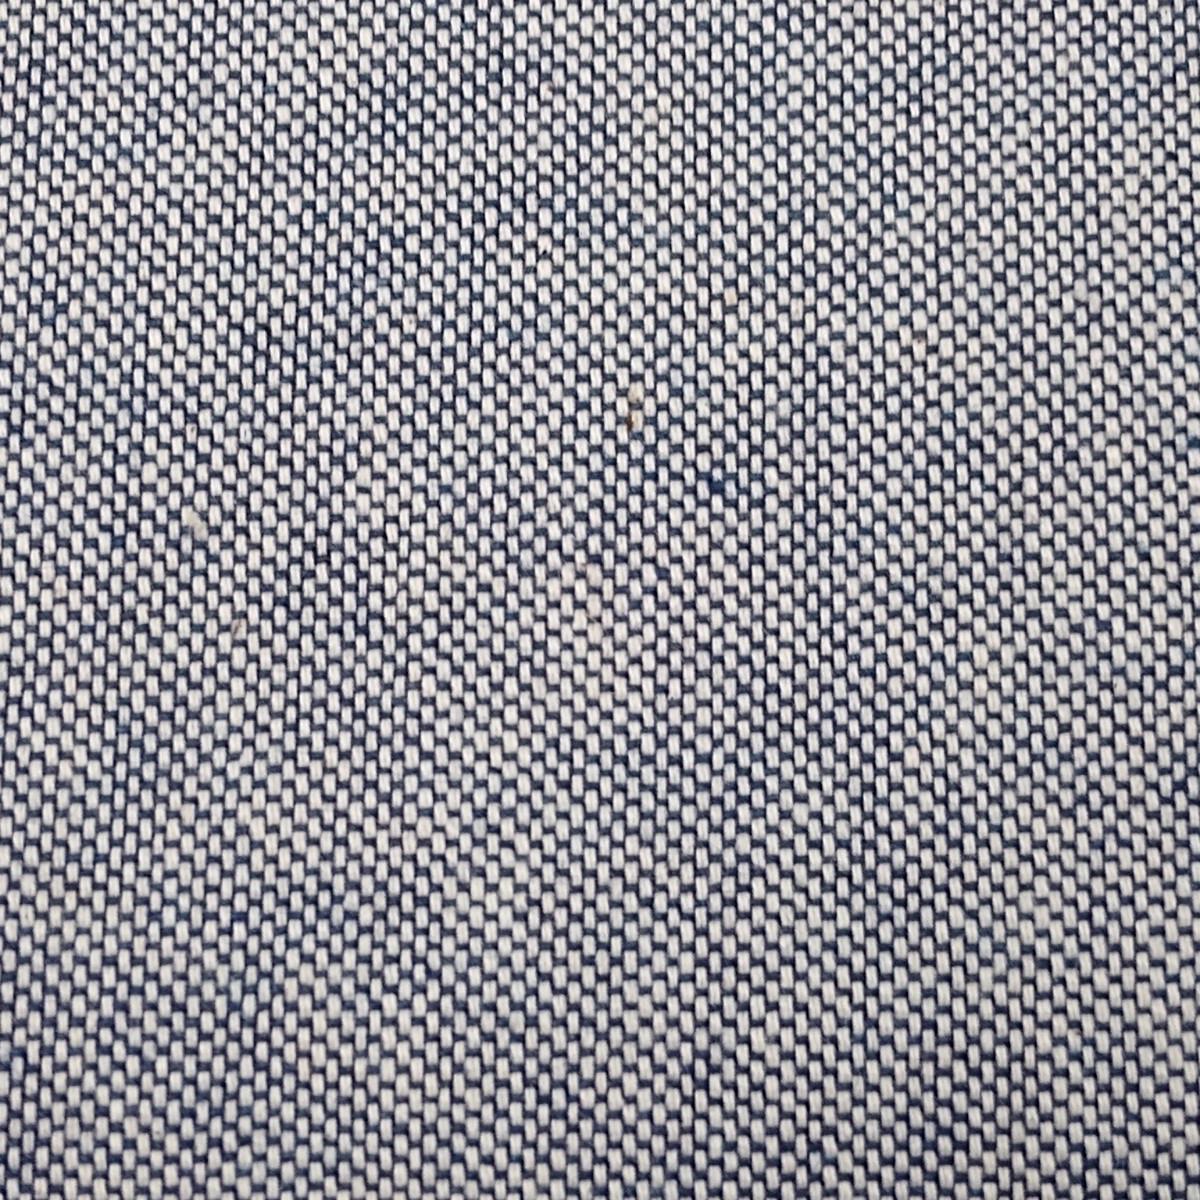 Recycle Canvas blau (87% Baumwolle), 140cm breit, 0.5m 6.50€